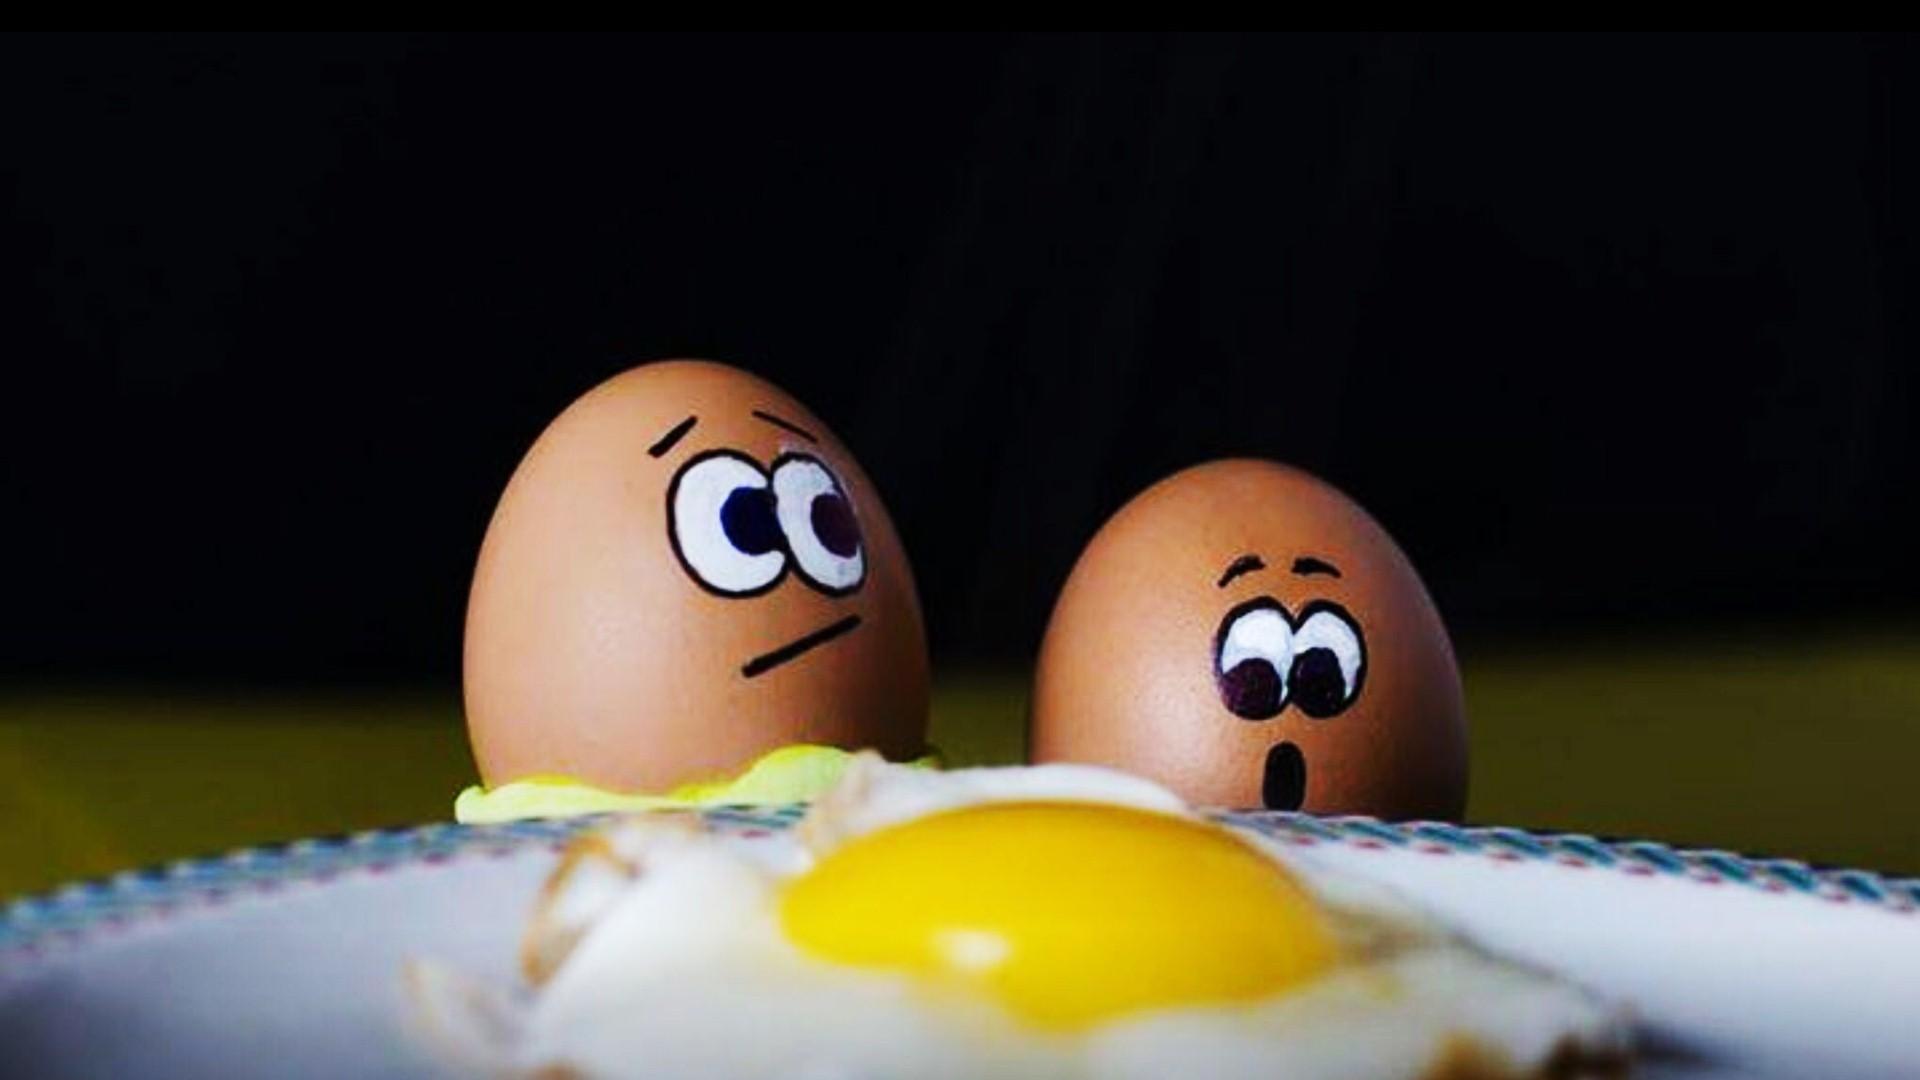 Funny Eggs Best Wallpaper 43502   Baltana 1920x1080